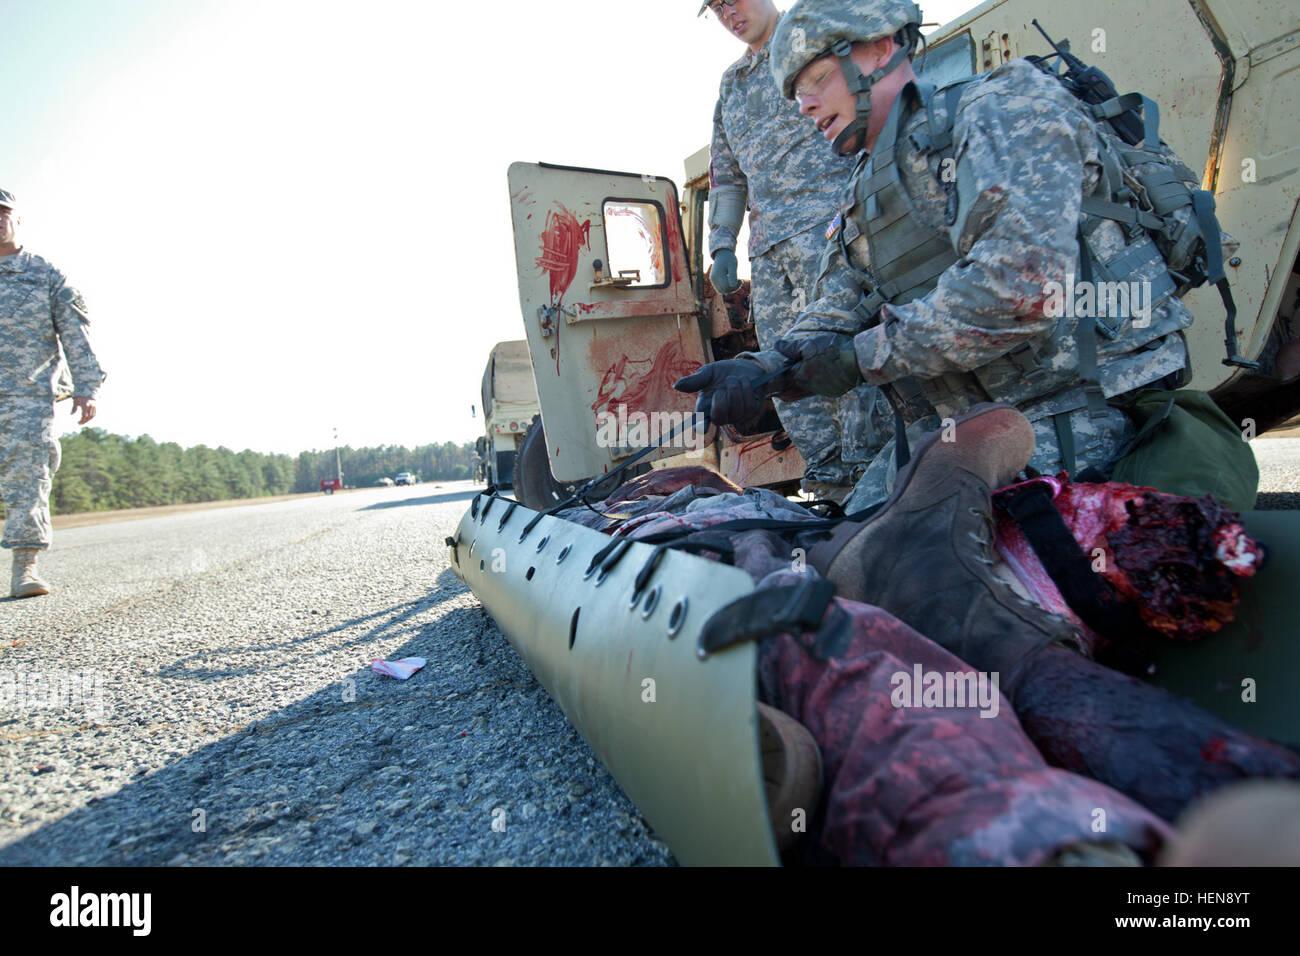 Groß Militär Bilderrahmen Fotos - Benutzerdefinierte Bilderrahmen ...